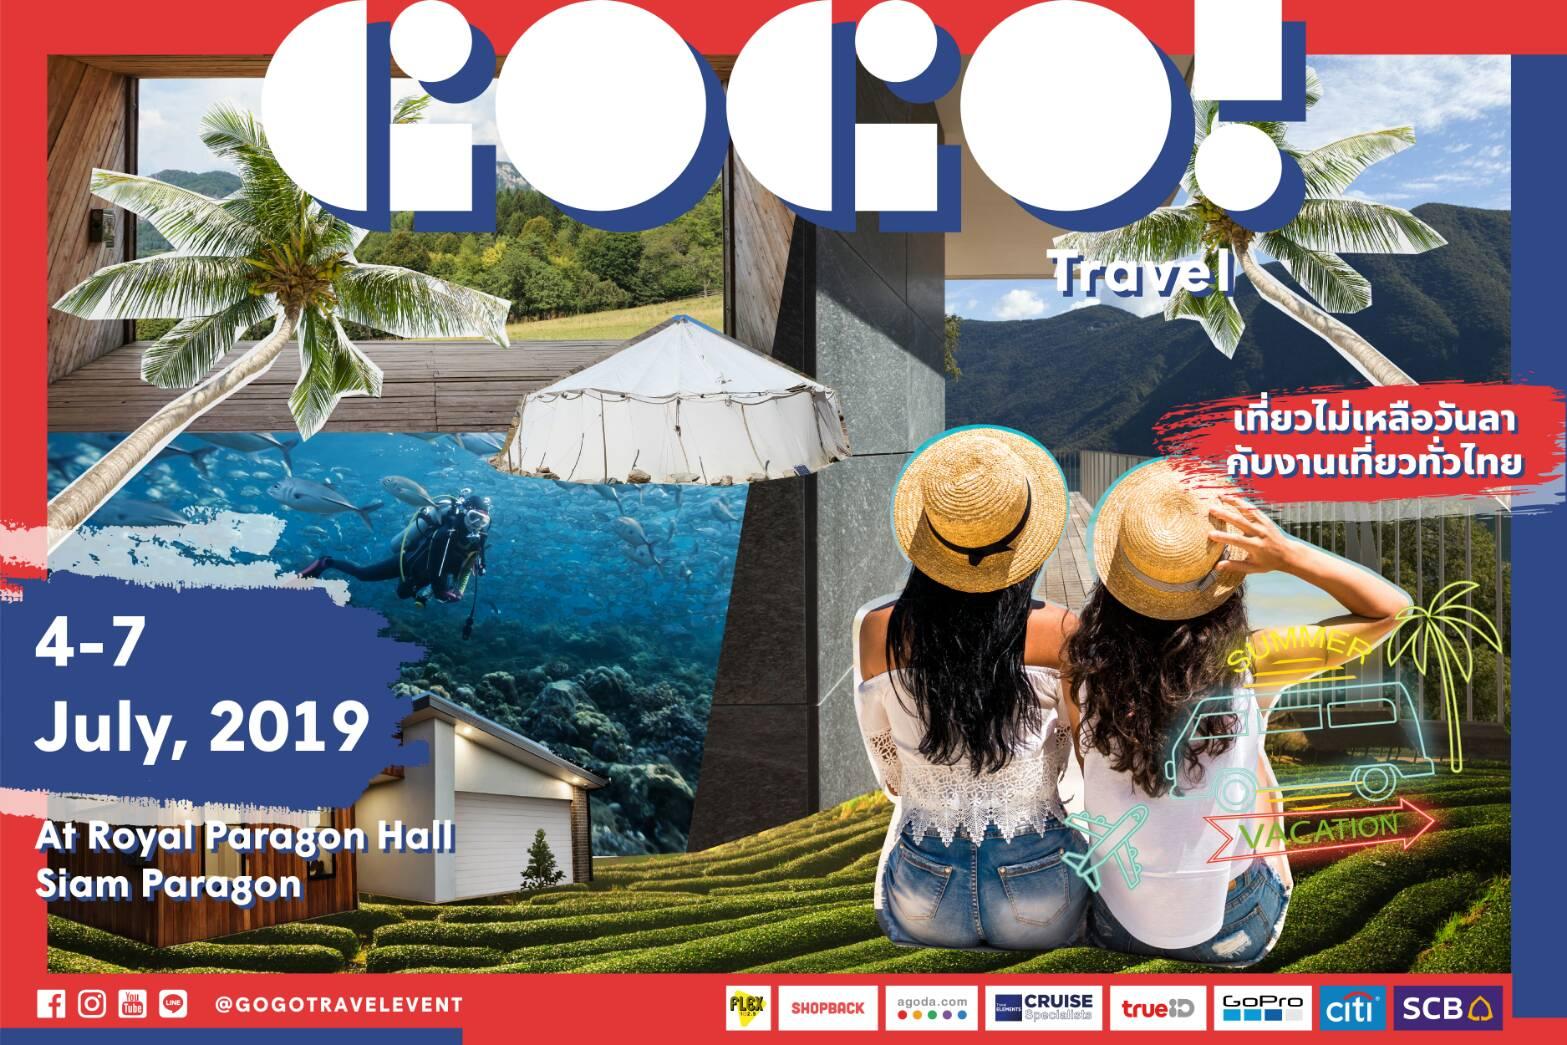 GOGO Travel เที่ยวทั่วไทย